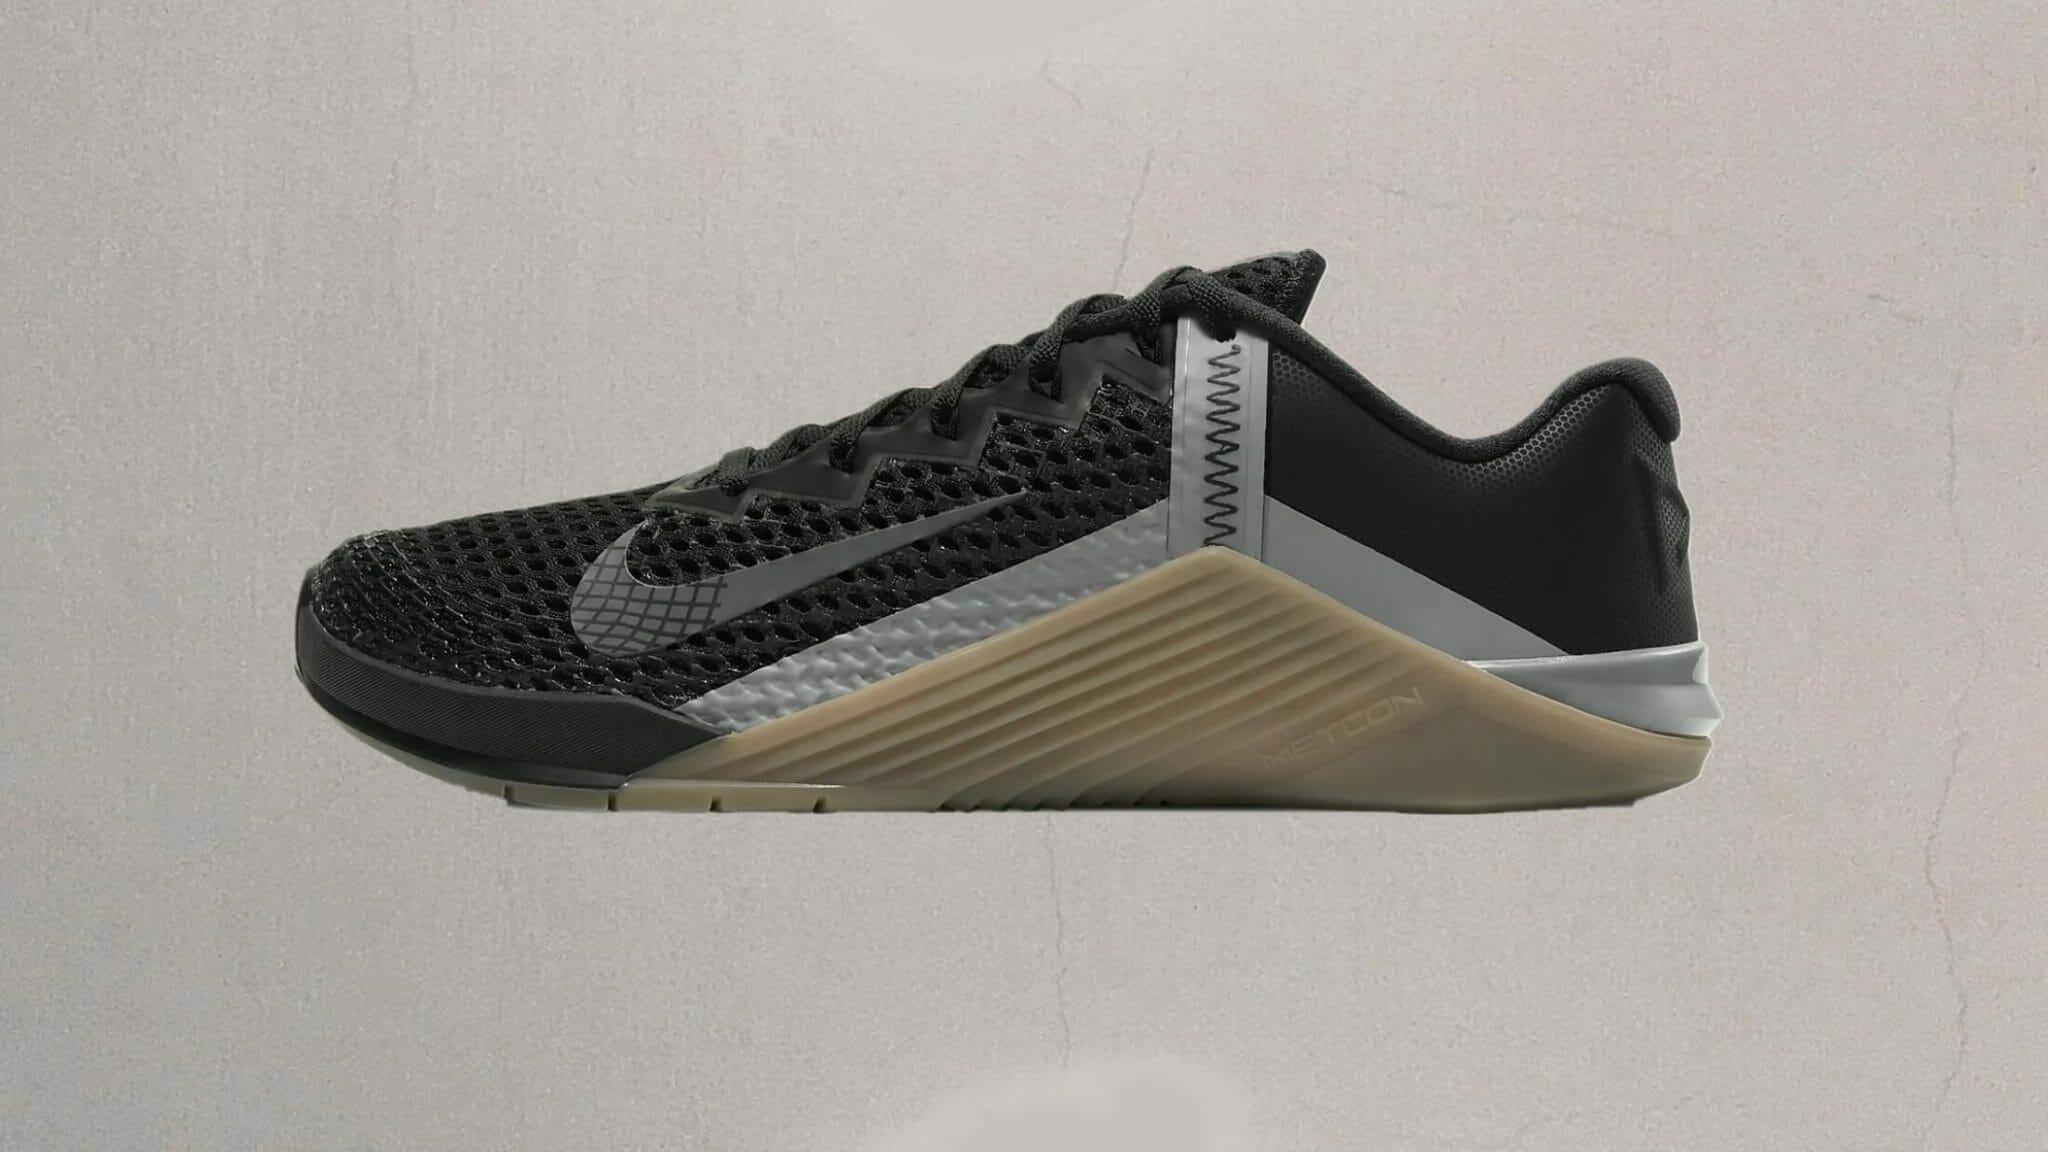 Nike Metcon 6 black and silver profile image.